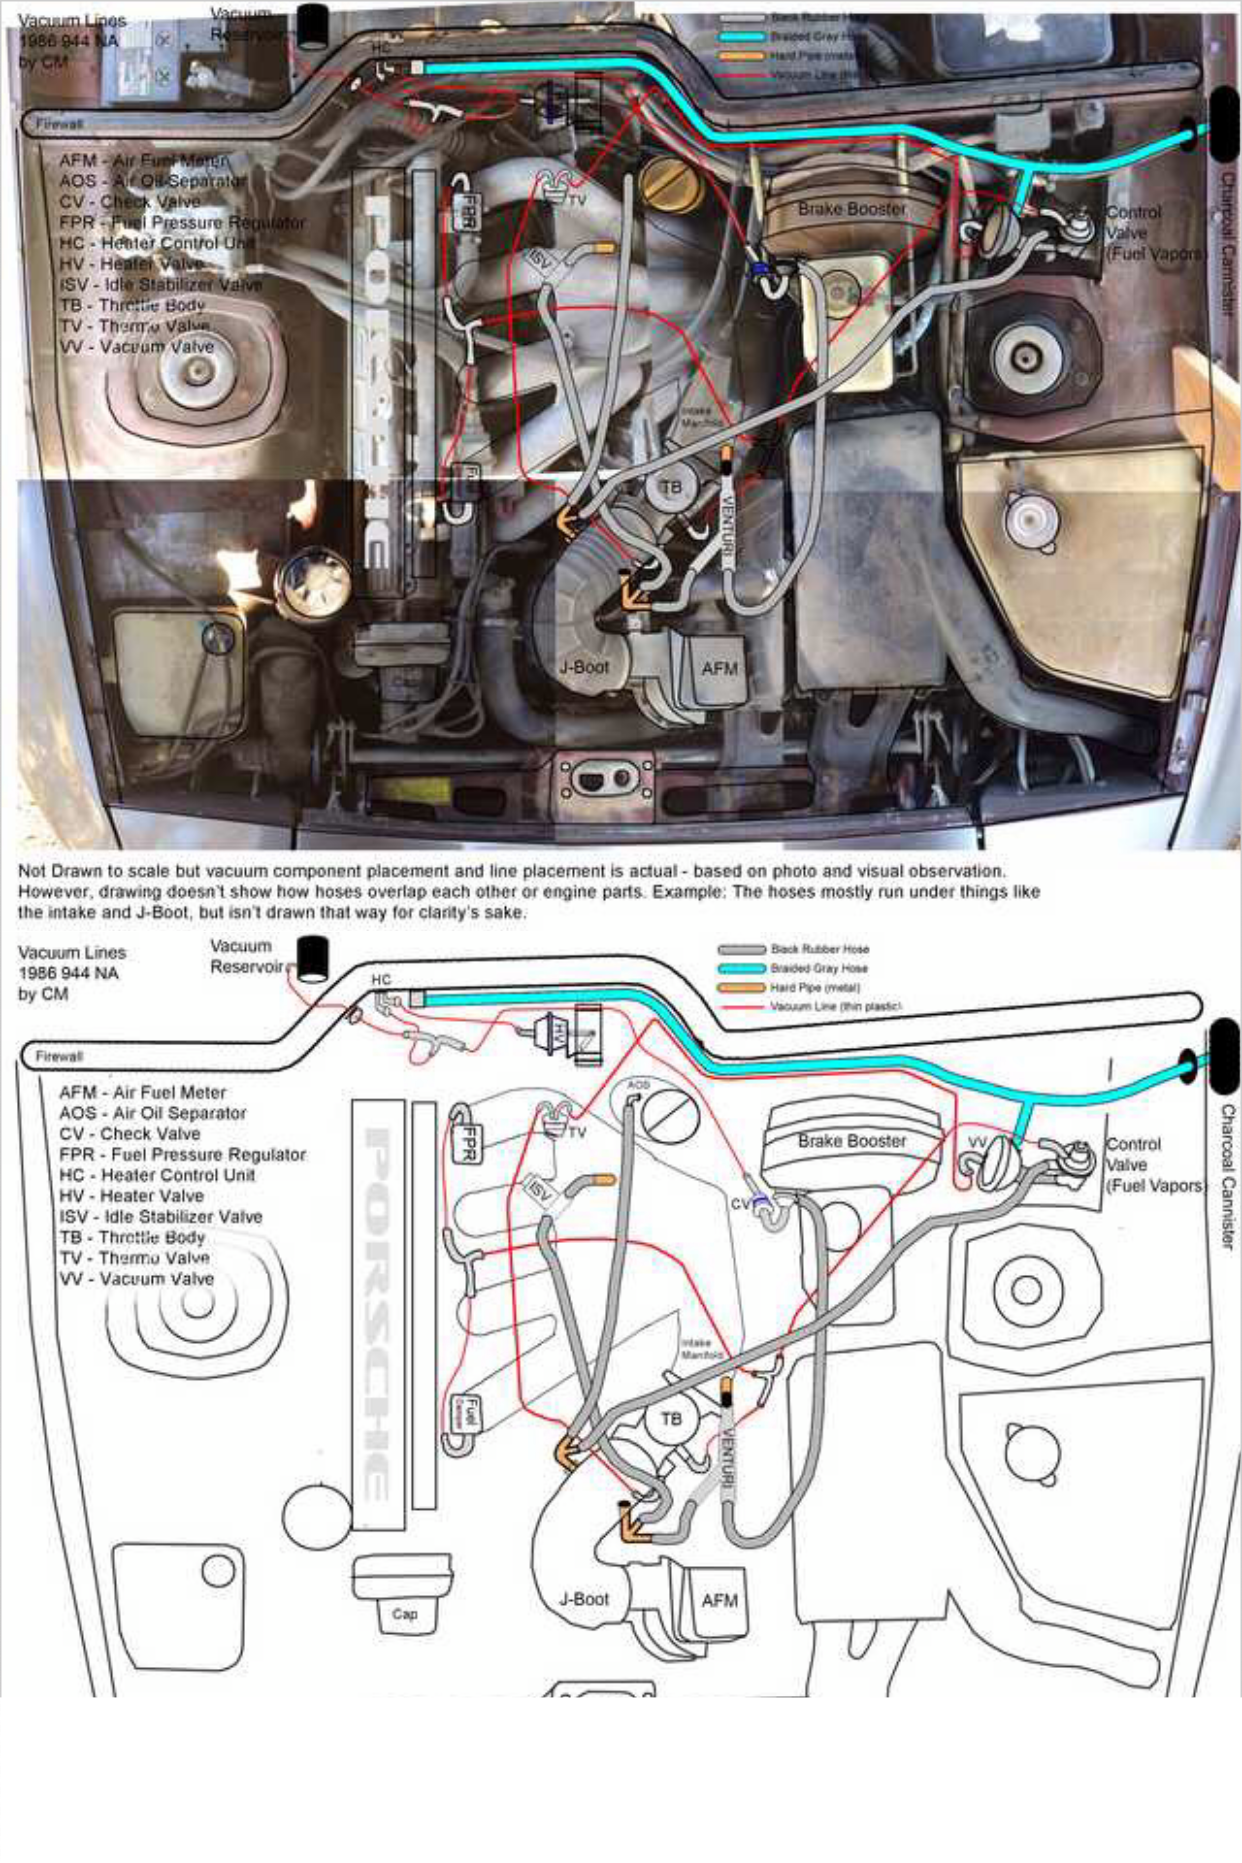 small resolution of 1986 porsche 944 vacuum line diagram overlay porsche transaxles 1986 porsche 944 vacuum line diagram overlay